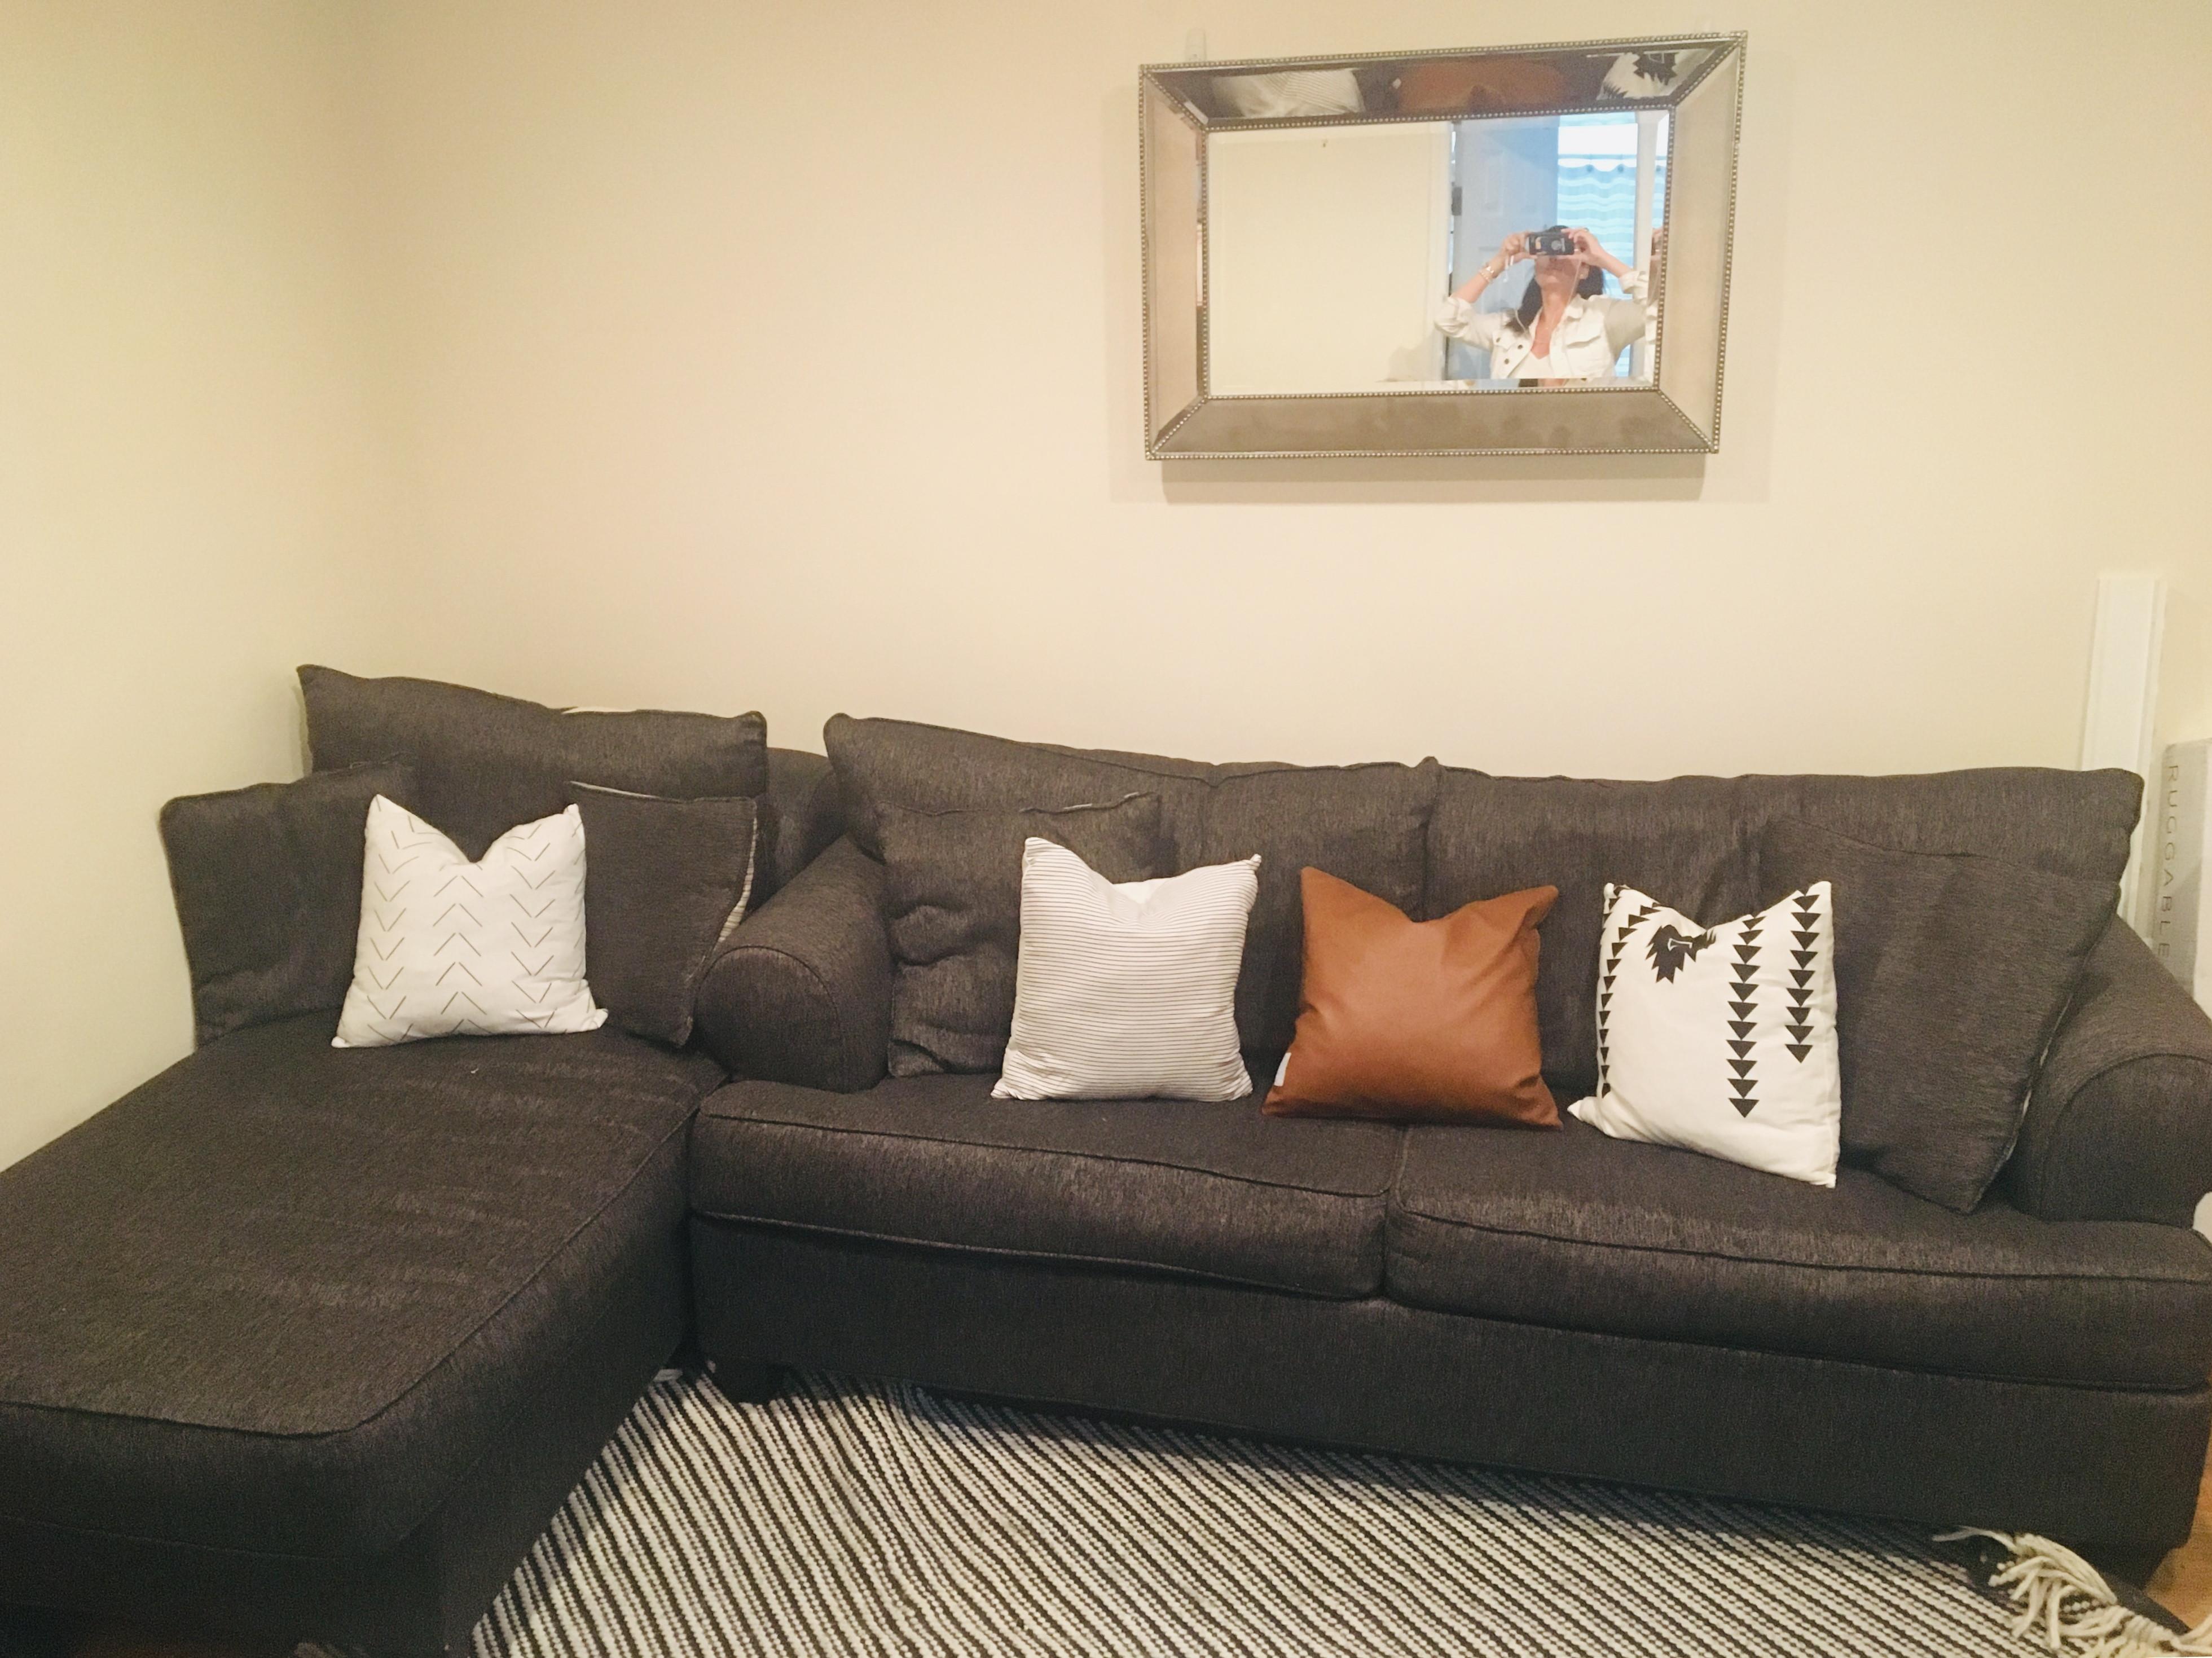 Tremendous Dark Grey Sleeper Sectional Sofa W Chaise Aptdeco Bralicious Painted Fabric Chair Ideas Braliciousco